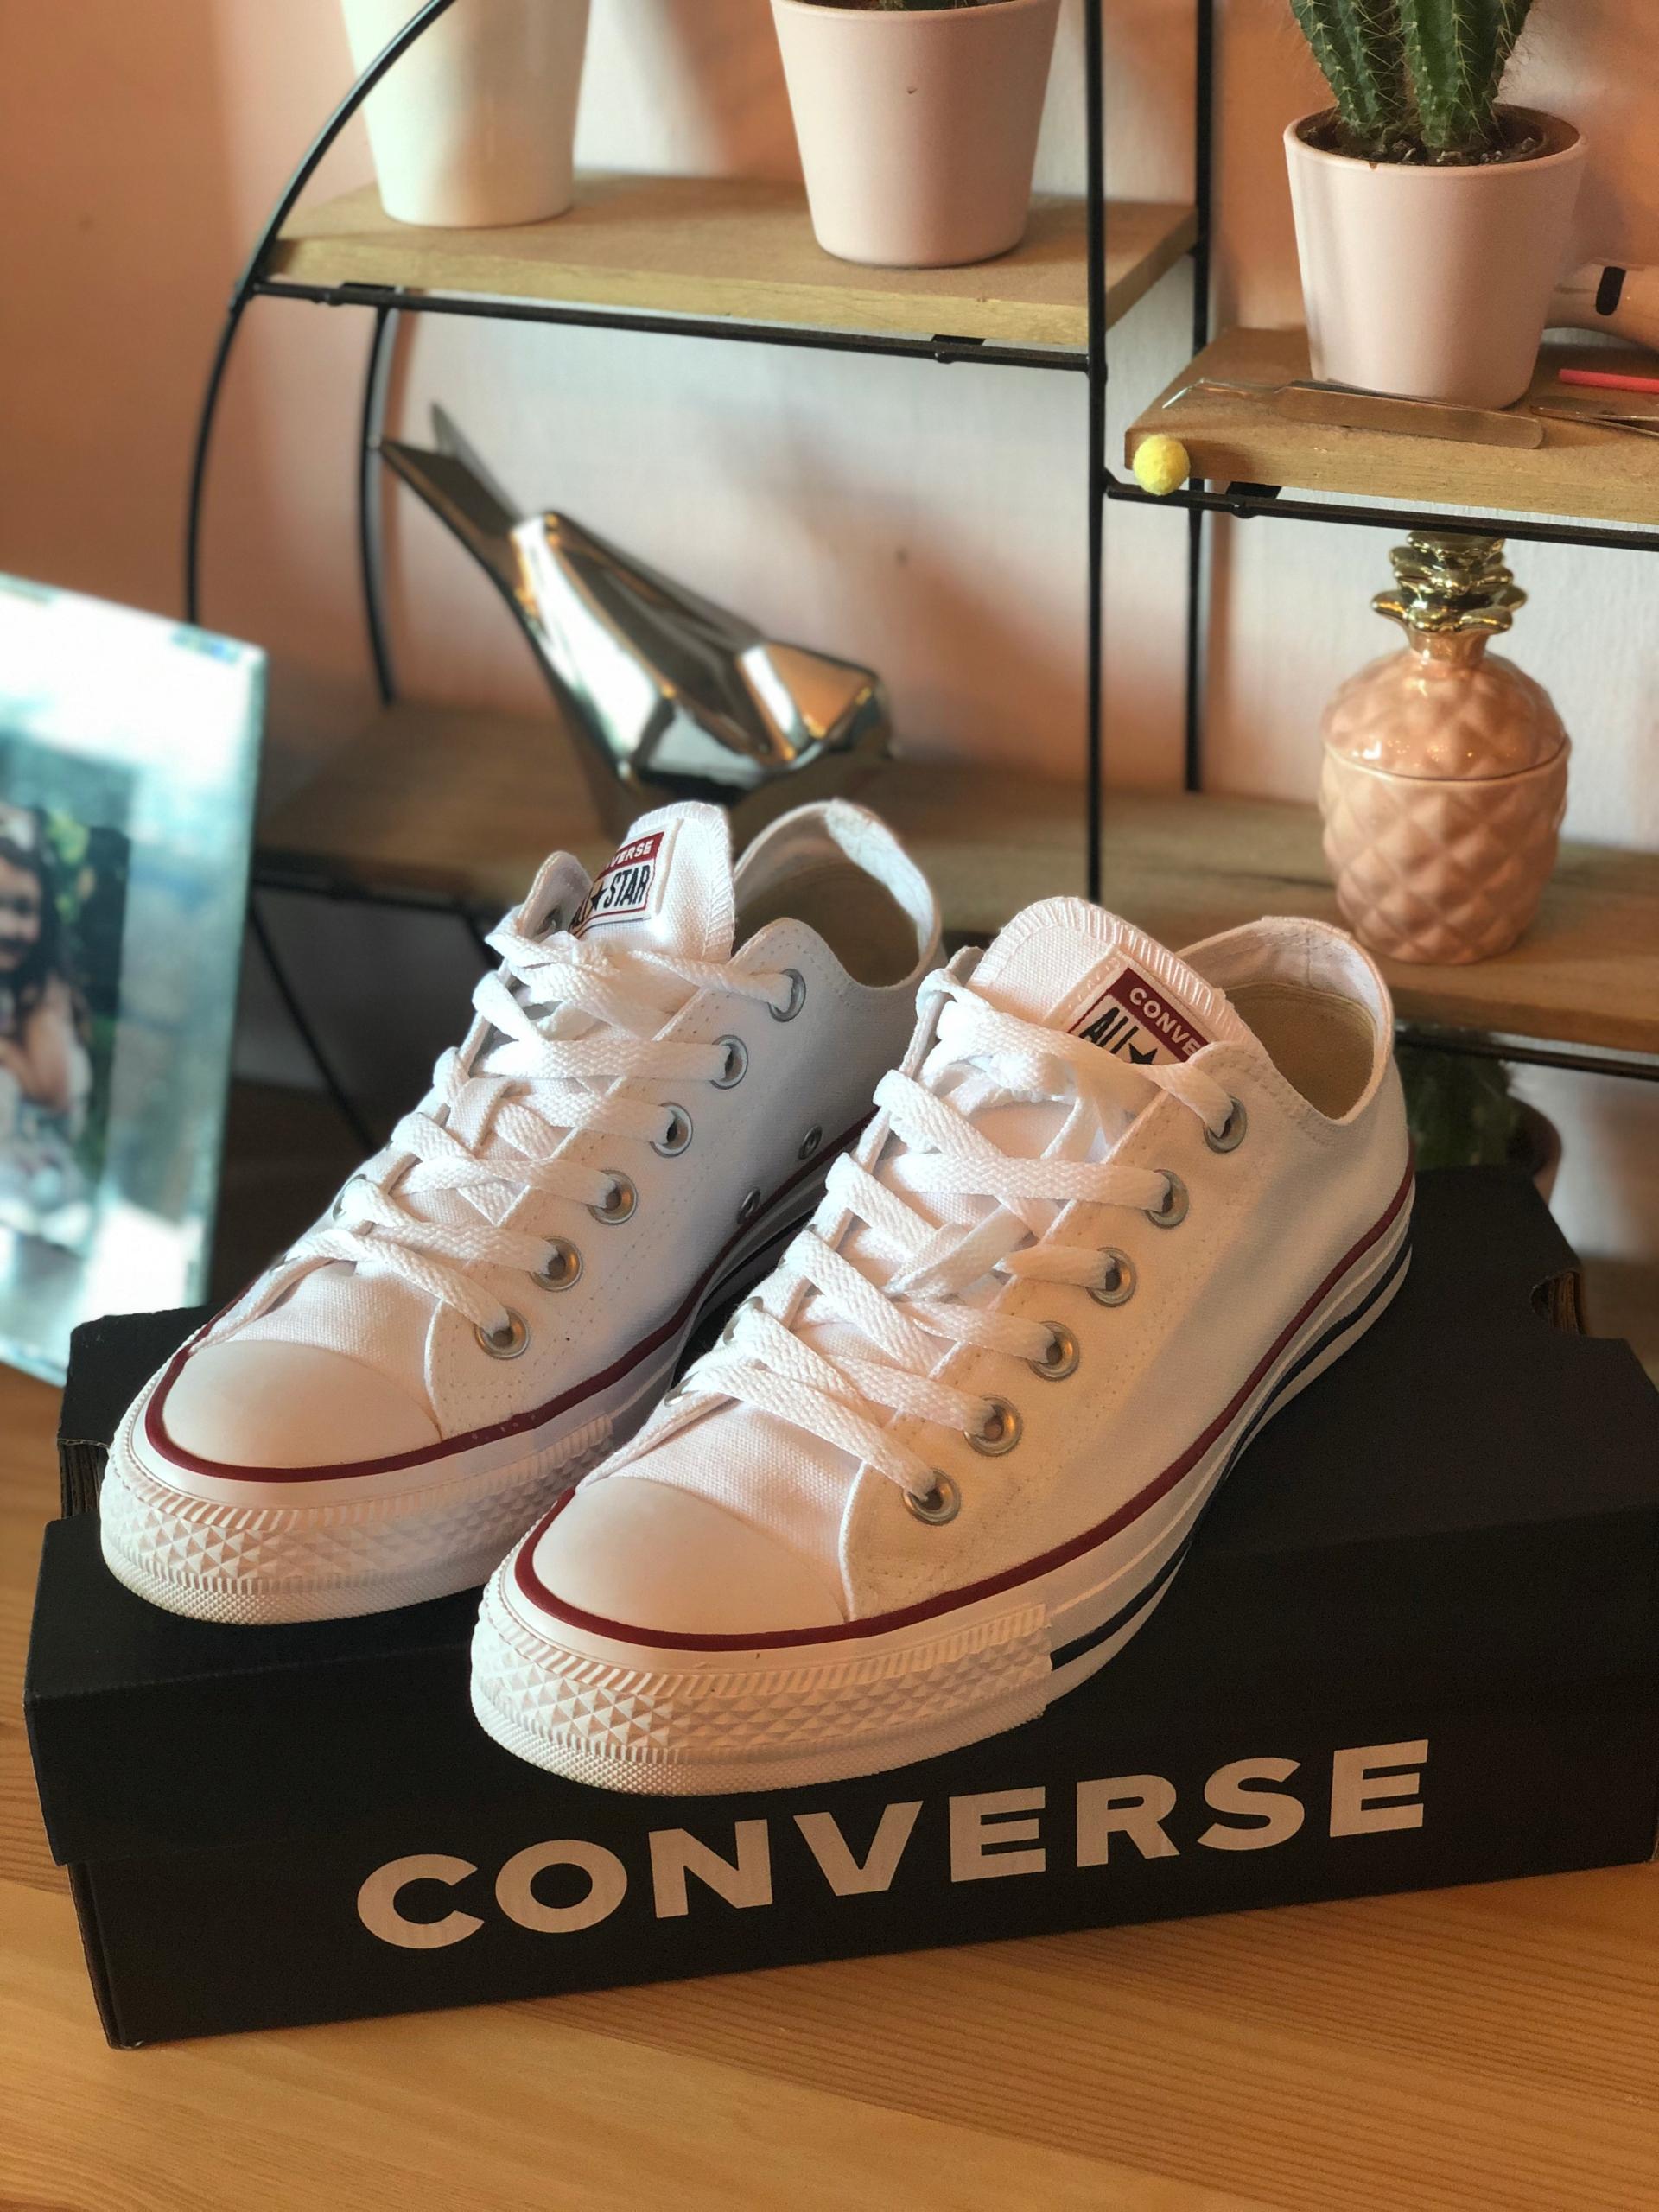 Converse All Star r 40/26cm NOWE GWARANCJA BIAŁE